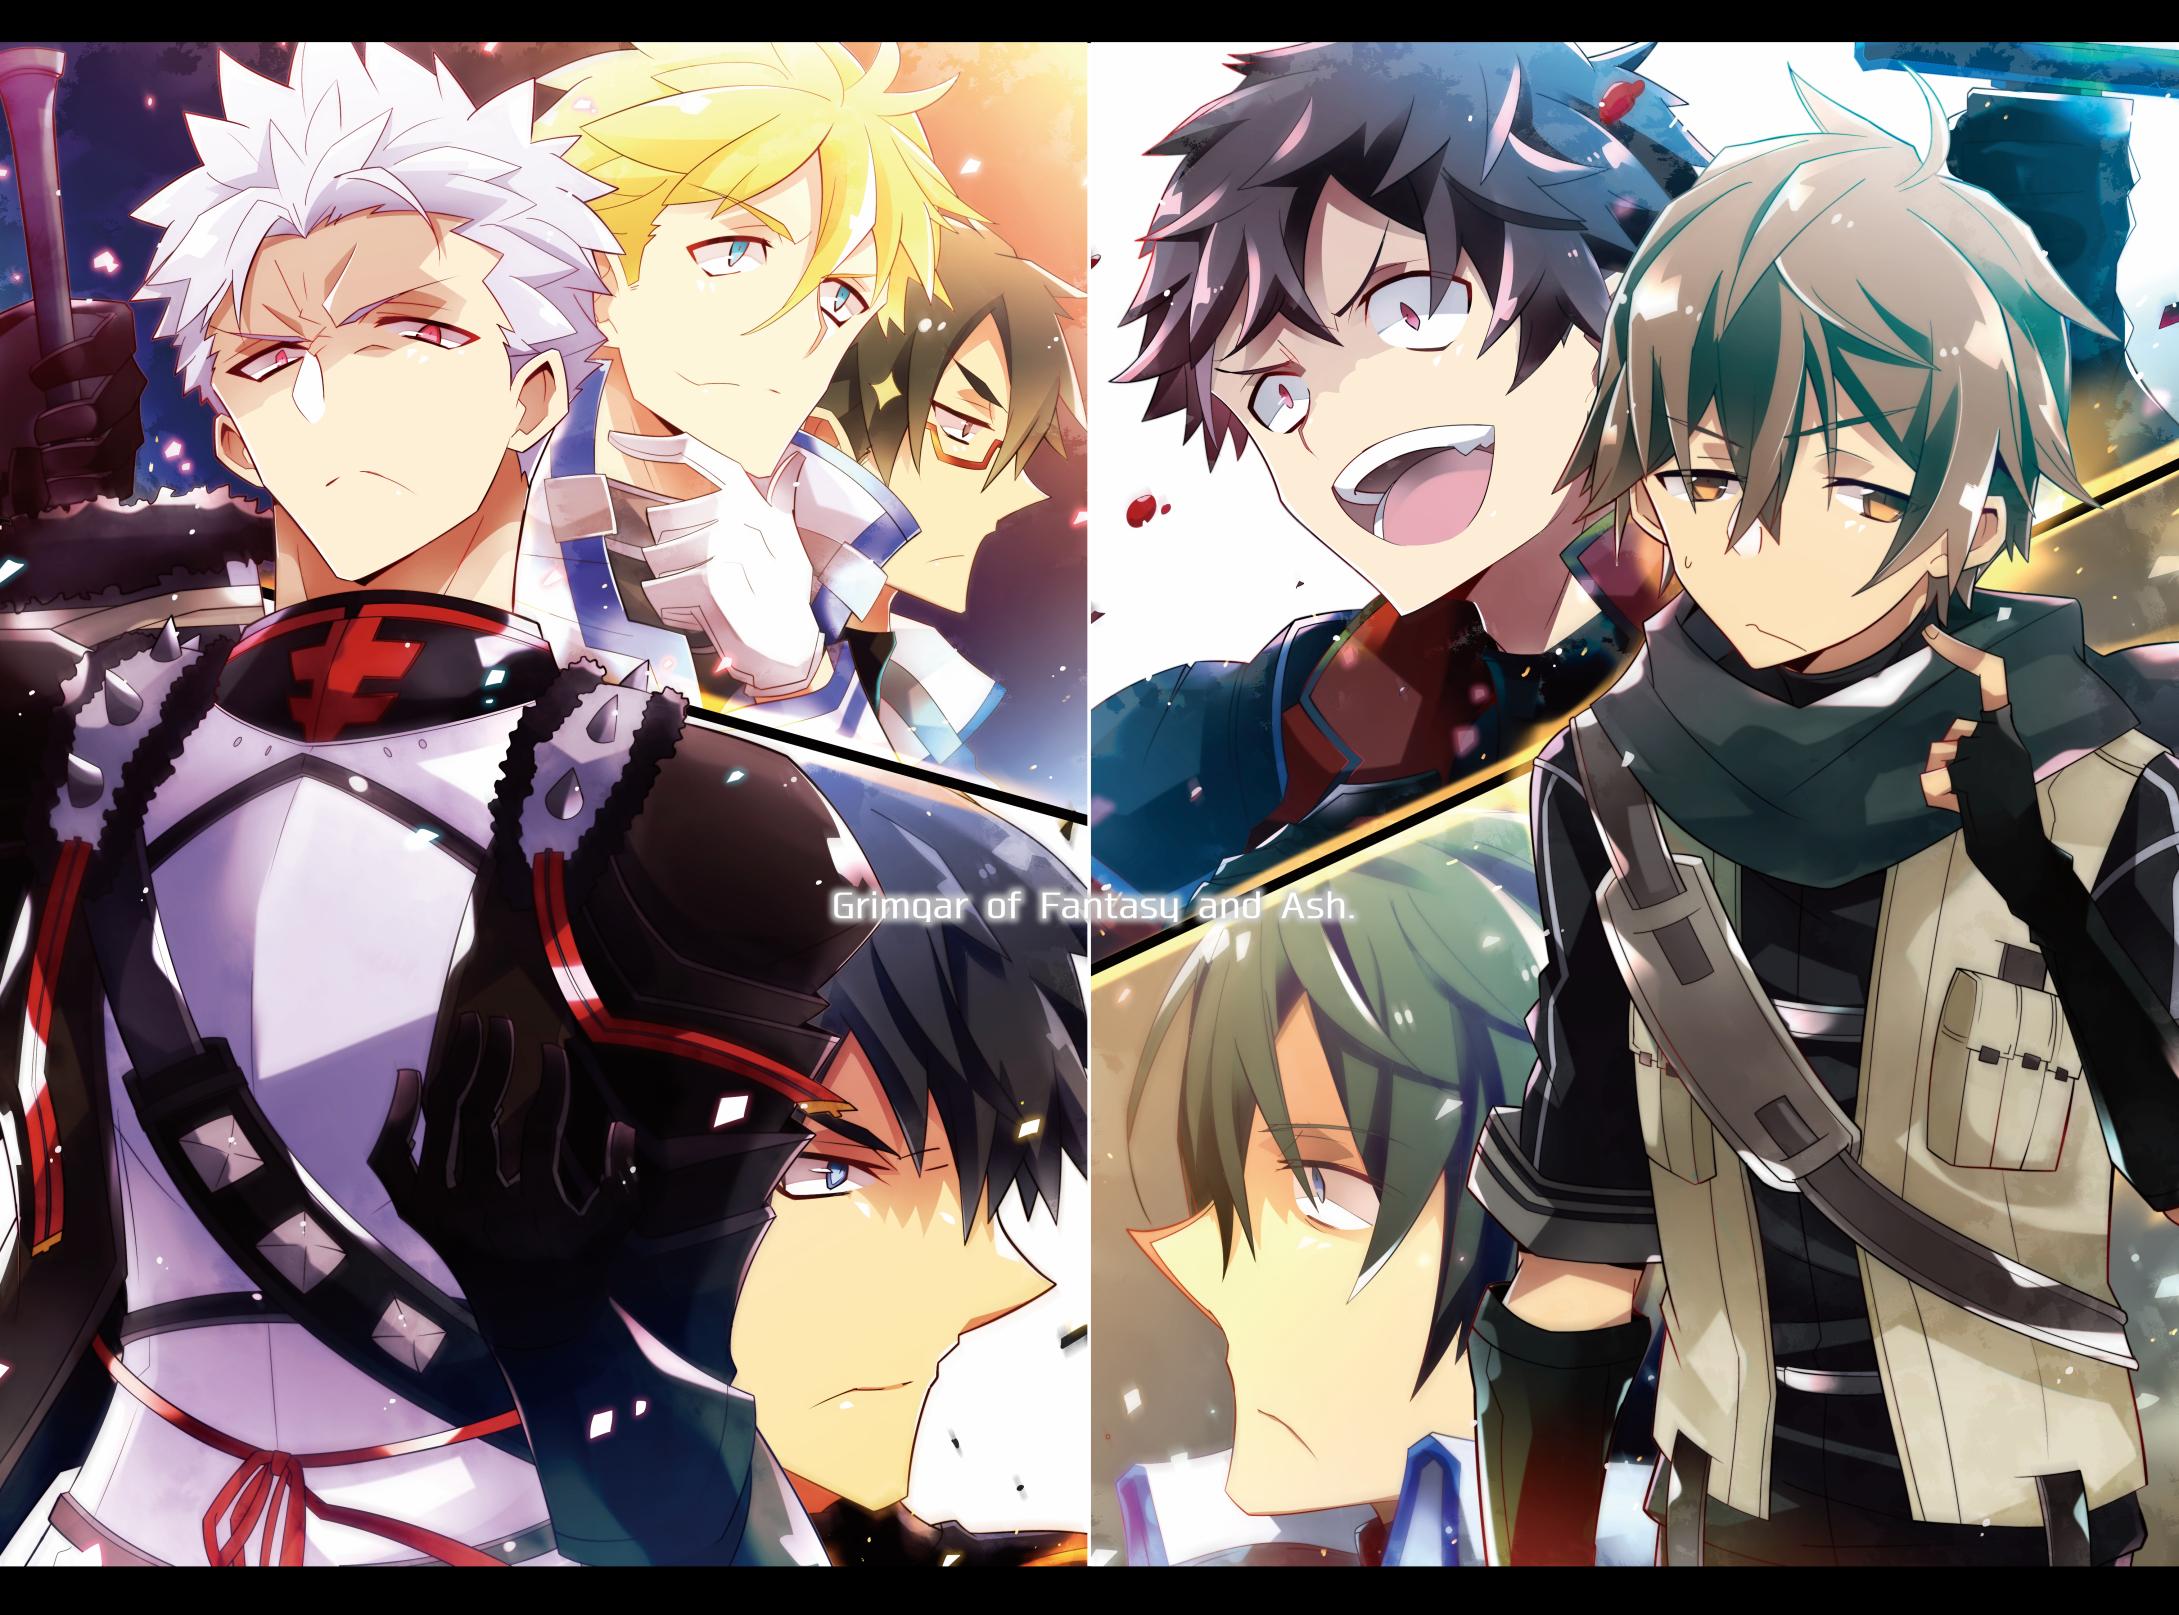 Anime Grimgar Of Fantasy And Ash Manato Ranta Haruhiro Wallpaper